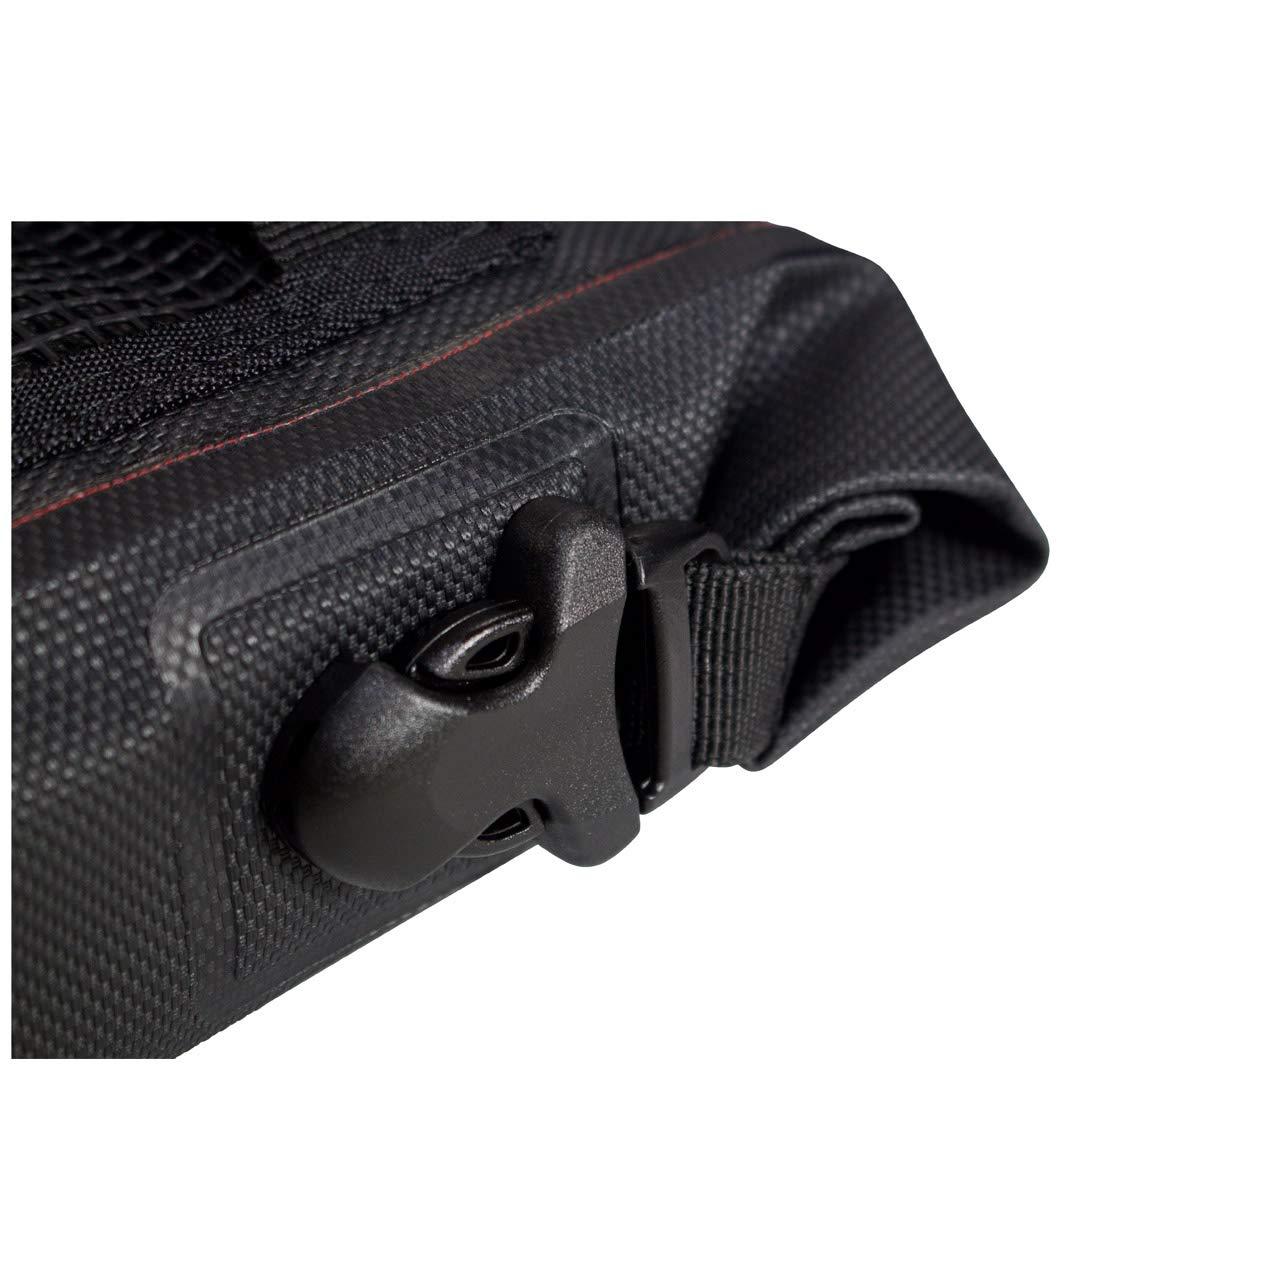 Motorrad Gep/äck Zusatztasche Fender Bag Enduristan